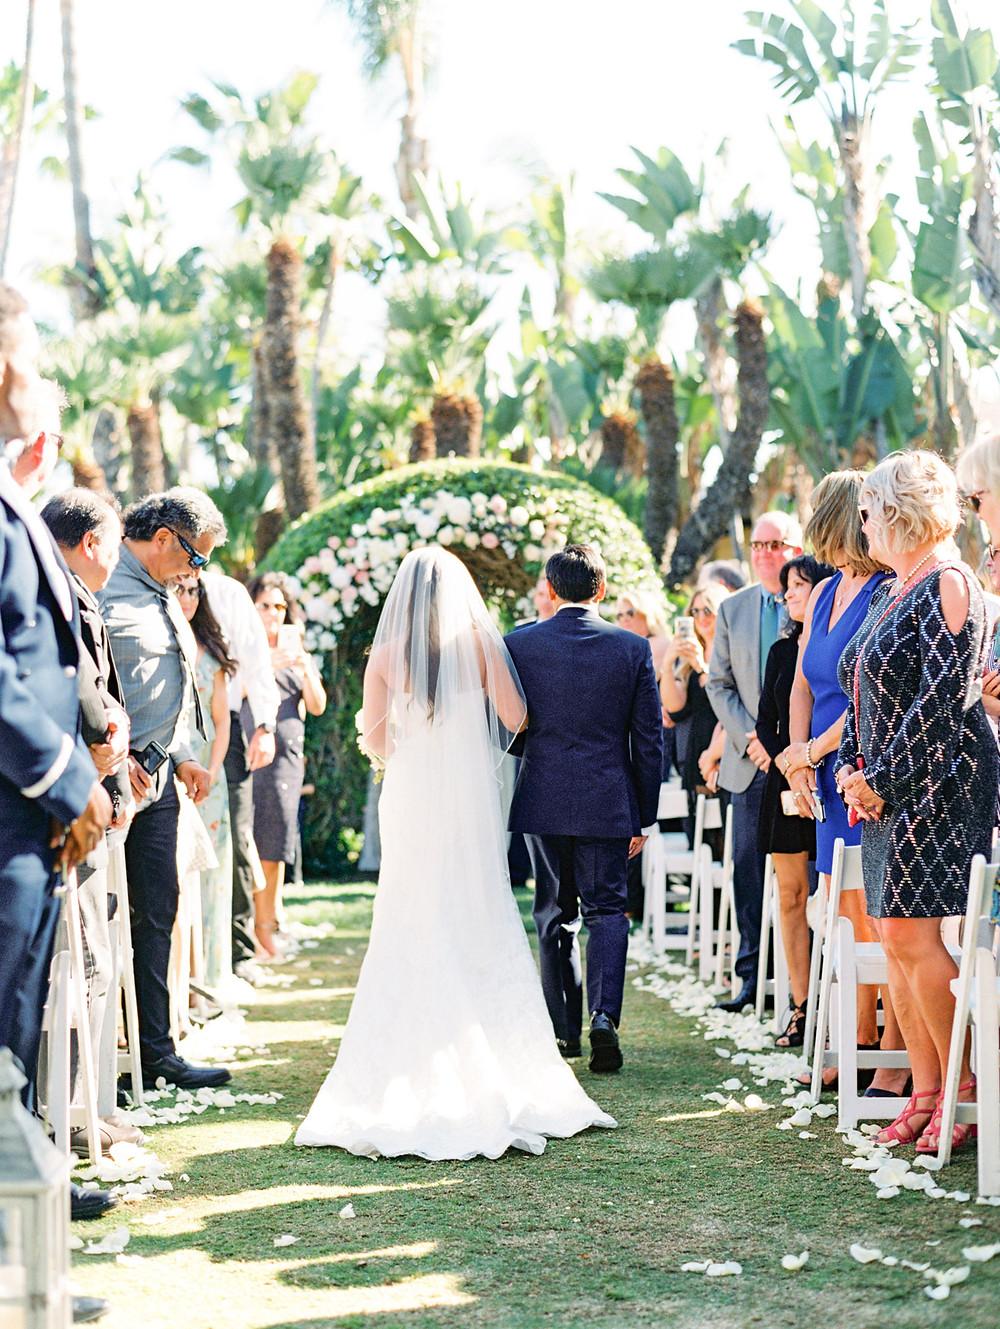 Mary + Nolan's Oceanfront Wedding at Humphrey's Half Moon Inn in San Diego, CA